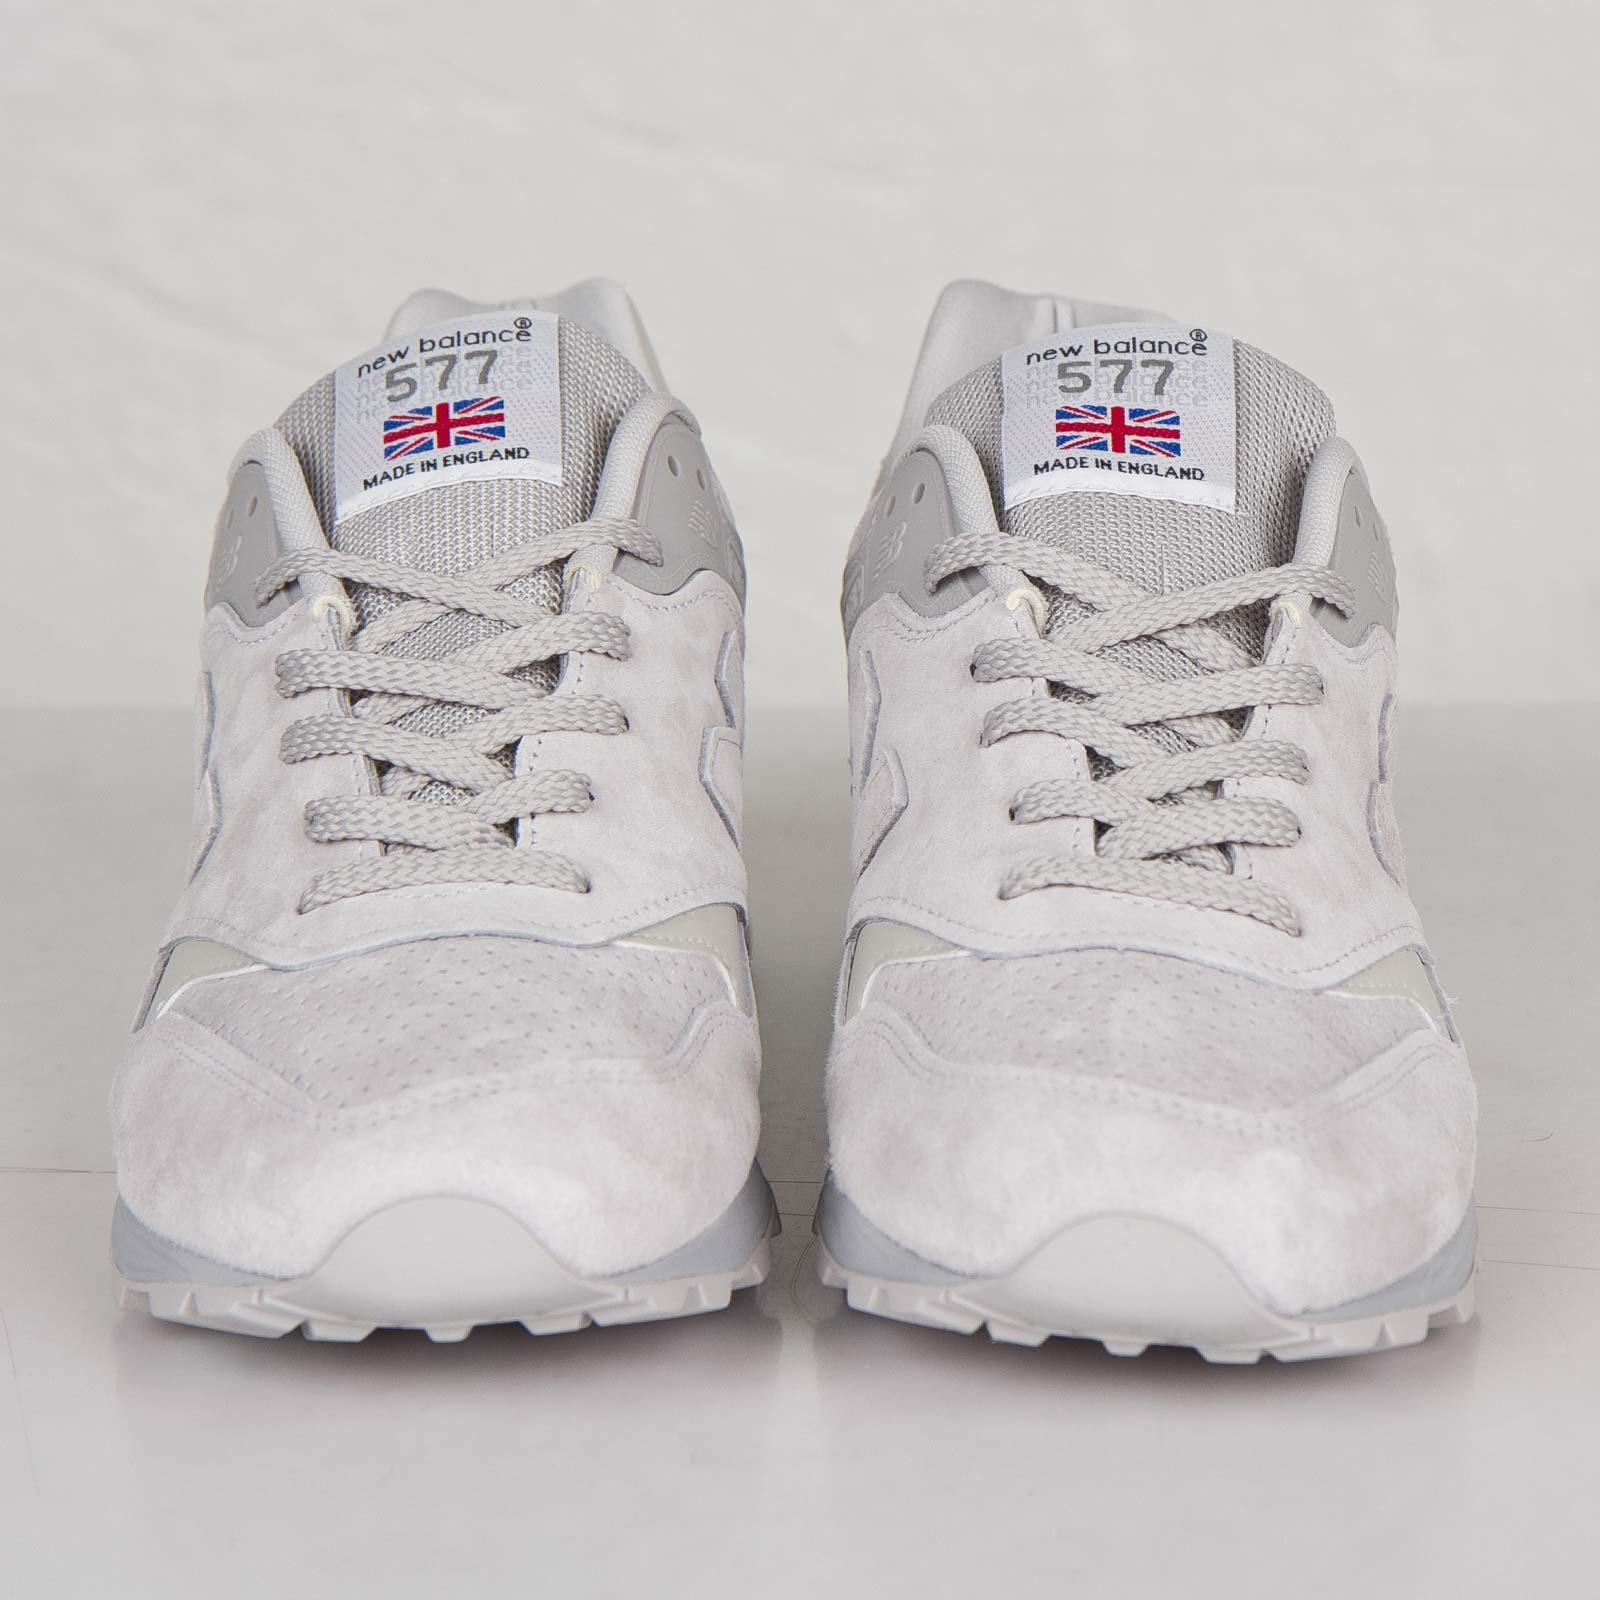 New Balance M577 - M577fw - SNS | sneakers & streetwear online ...